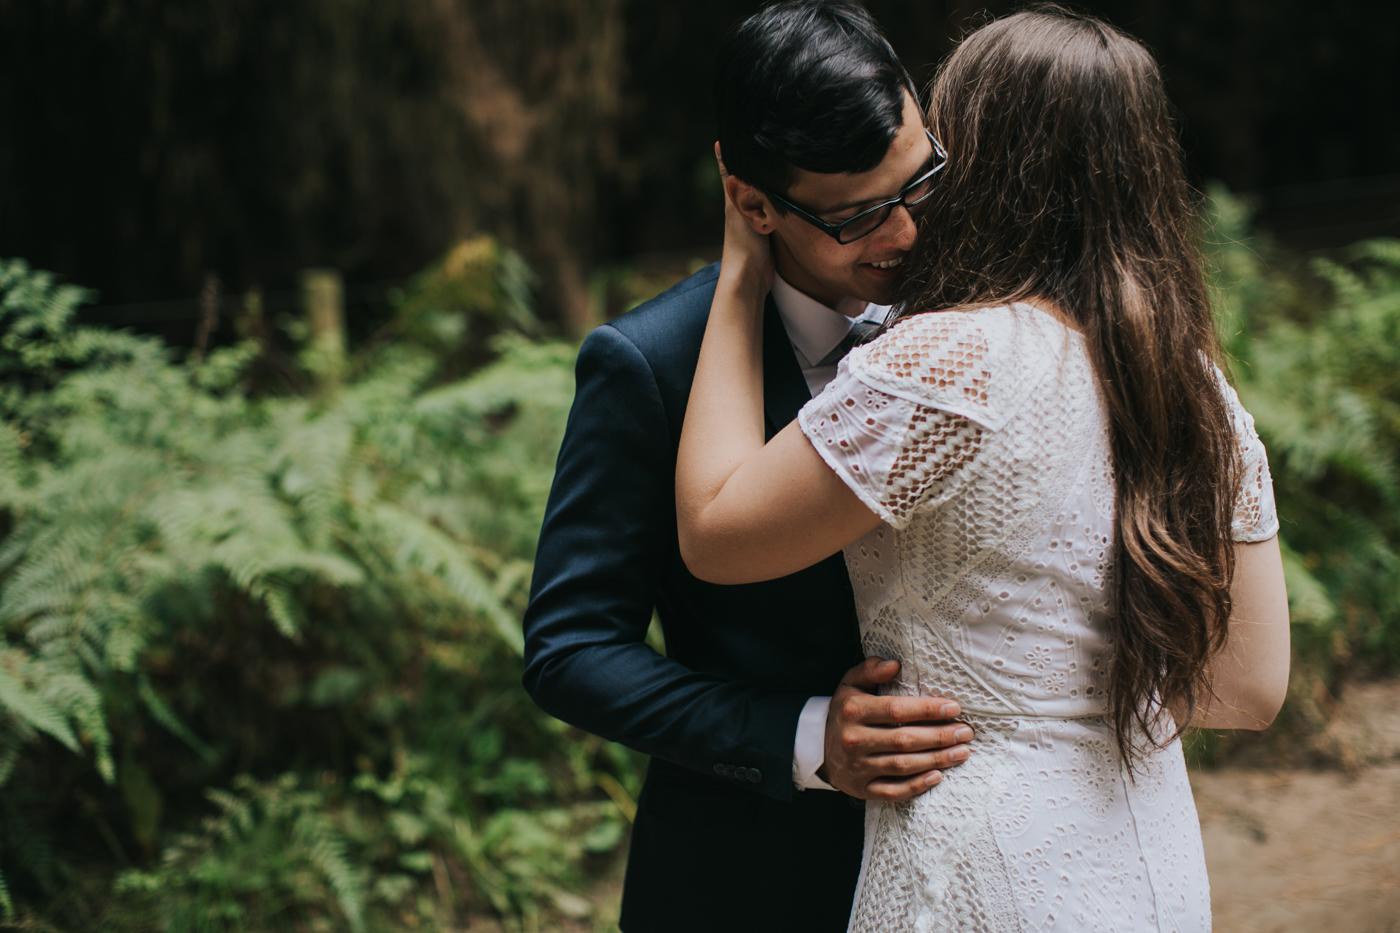 Ariana & Tim - Dunedin, New Zealand Wedding - Destination Wedding - Samantha Heather Photography-174.jpg